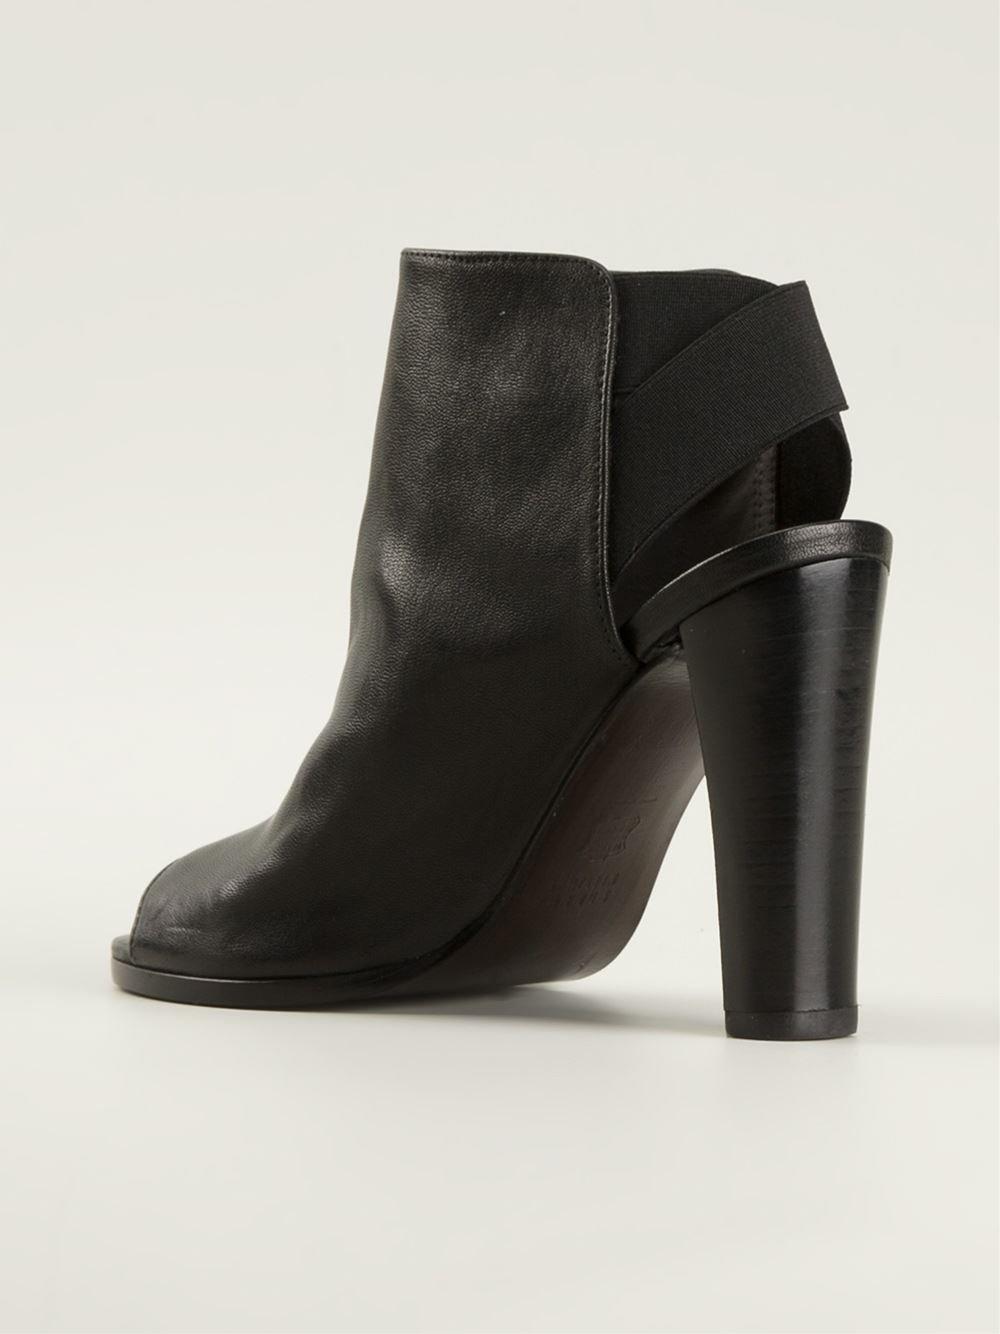 Lyst Stuart Weitzman Peep Toe Chunky Heel Sandals In Black